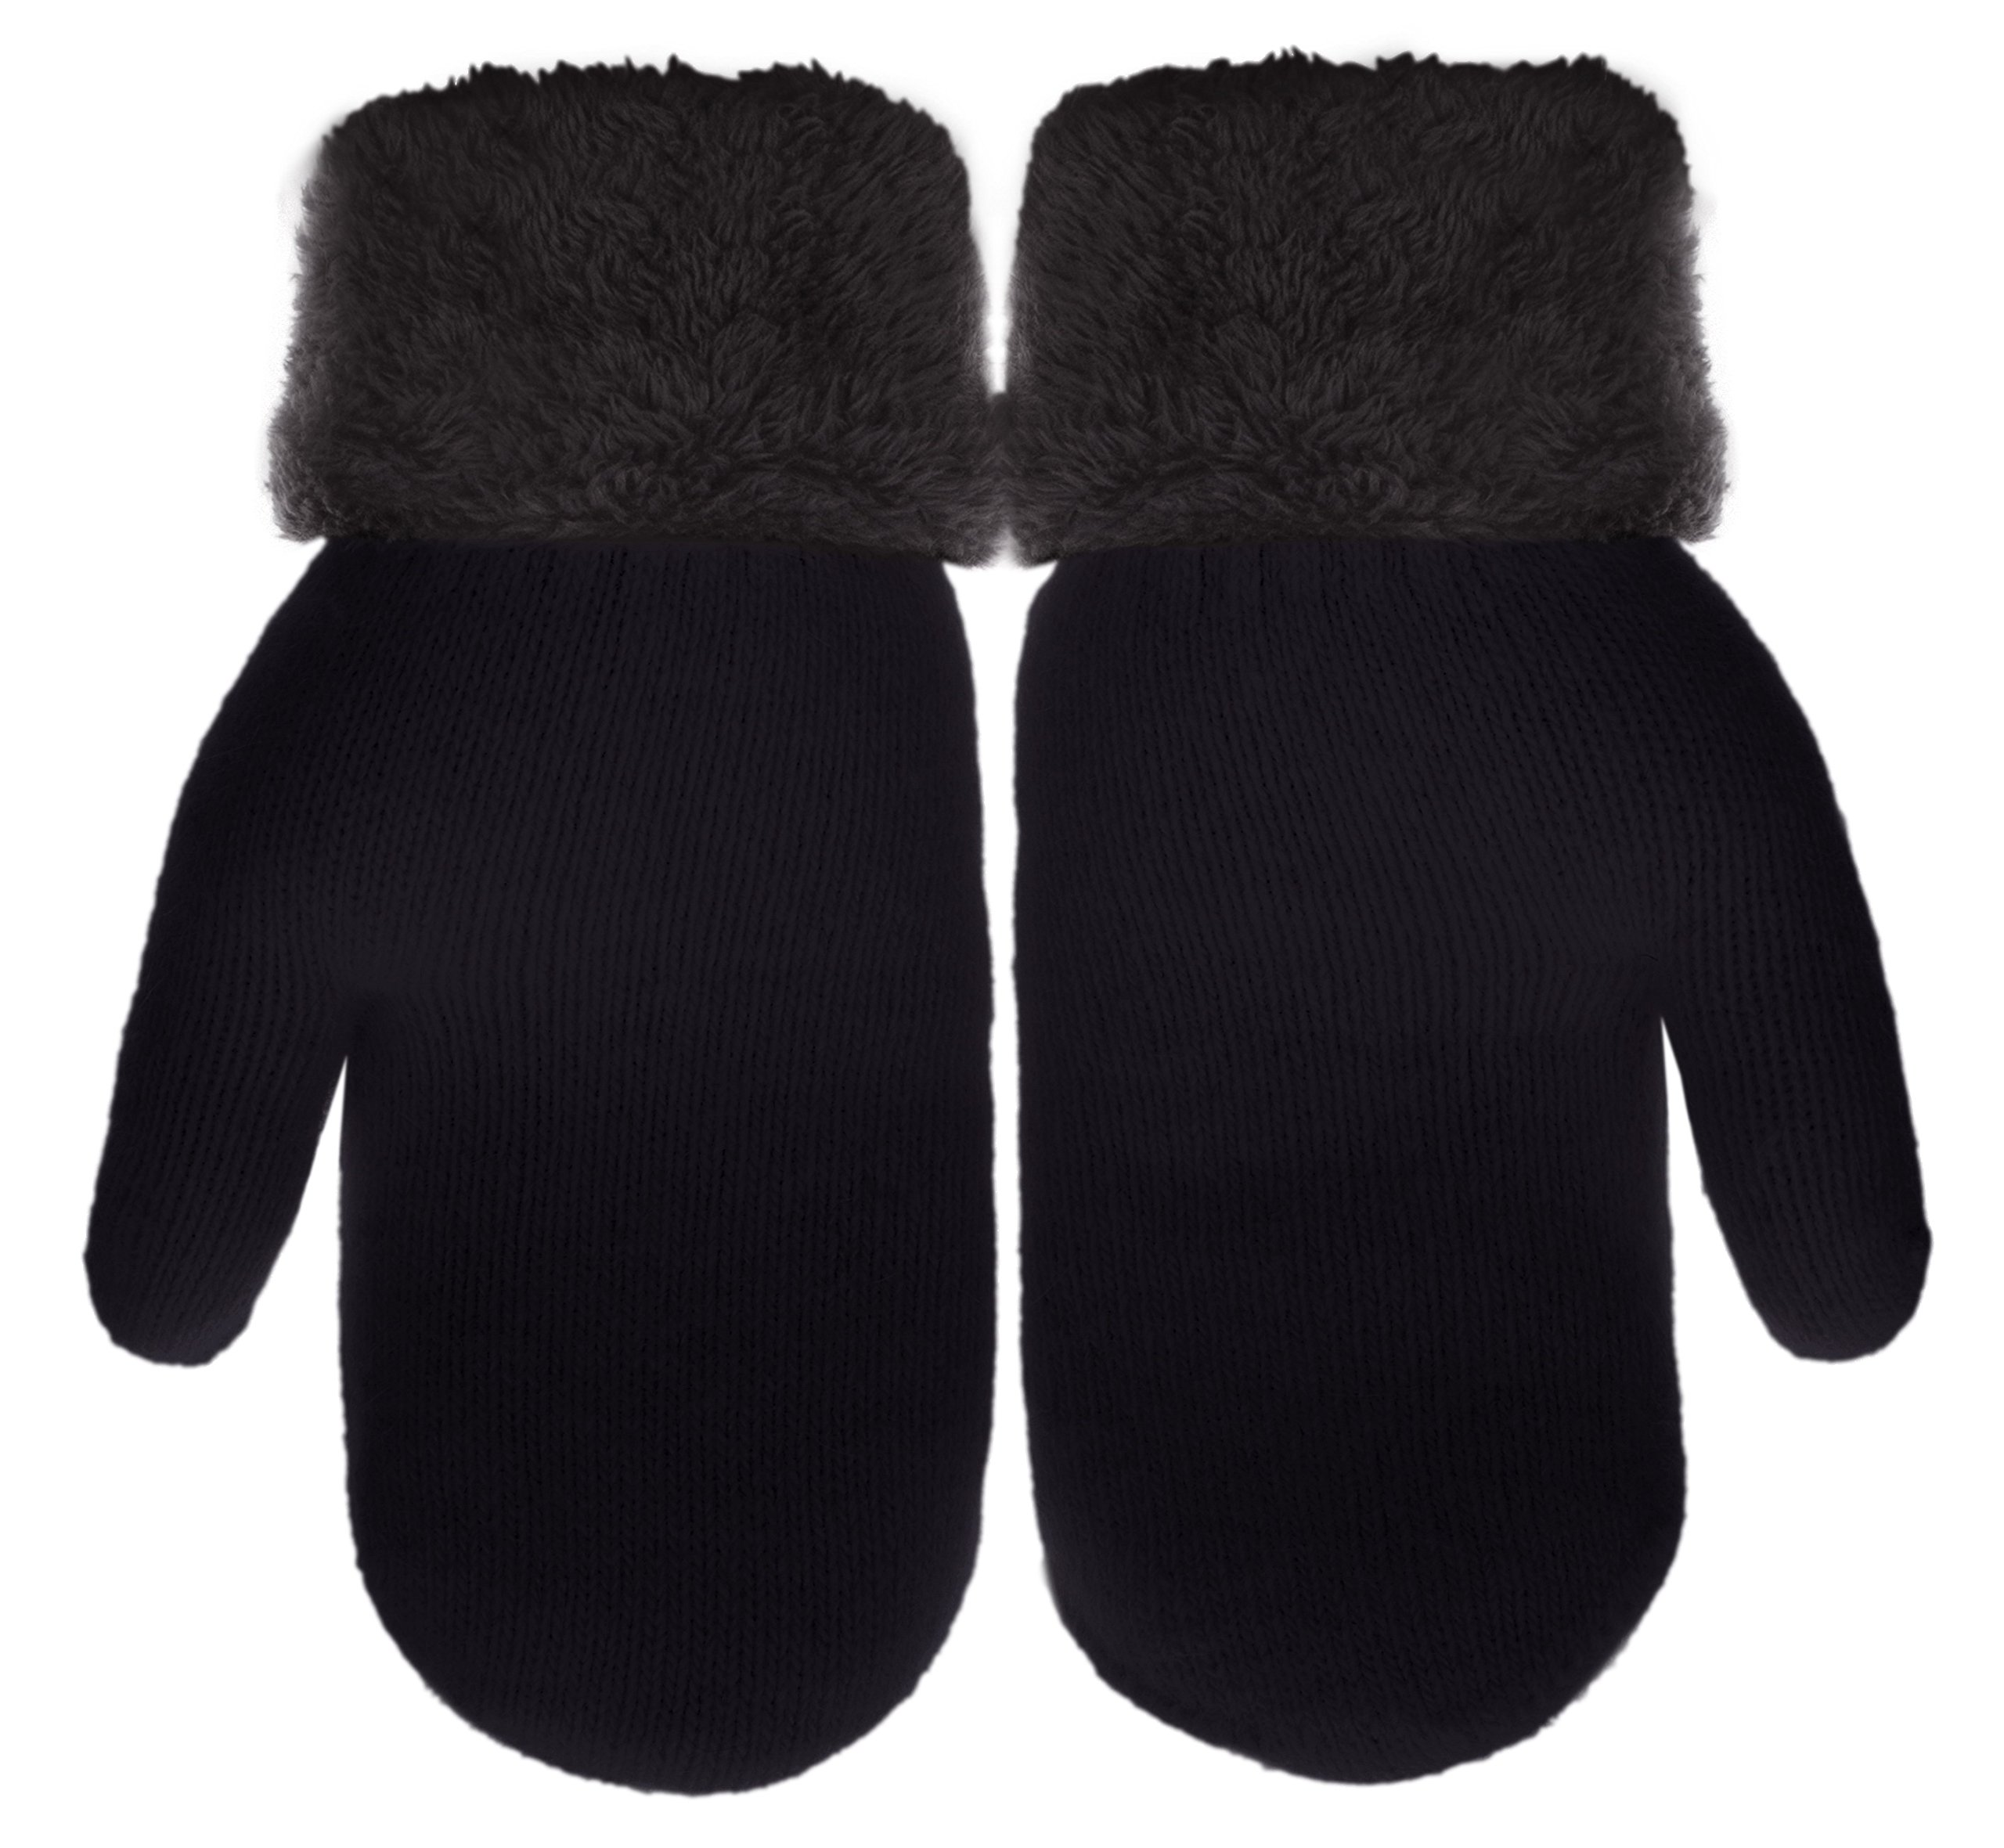 IL Caldo Womens Winter Gloves Plush Edge Warm Thick Knitted Mitten Drive Work Glove,Black